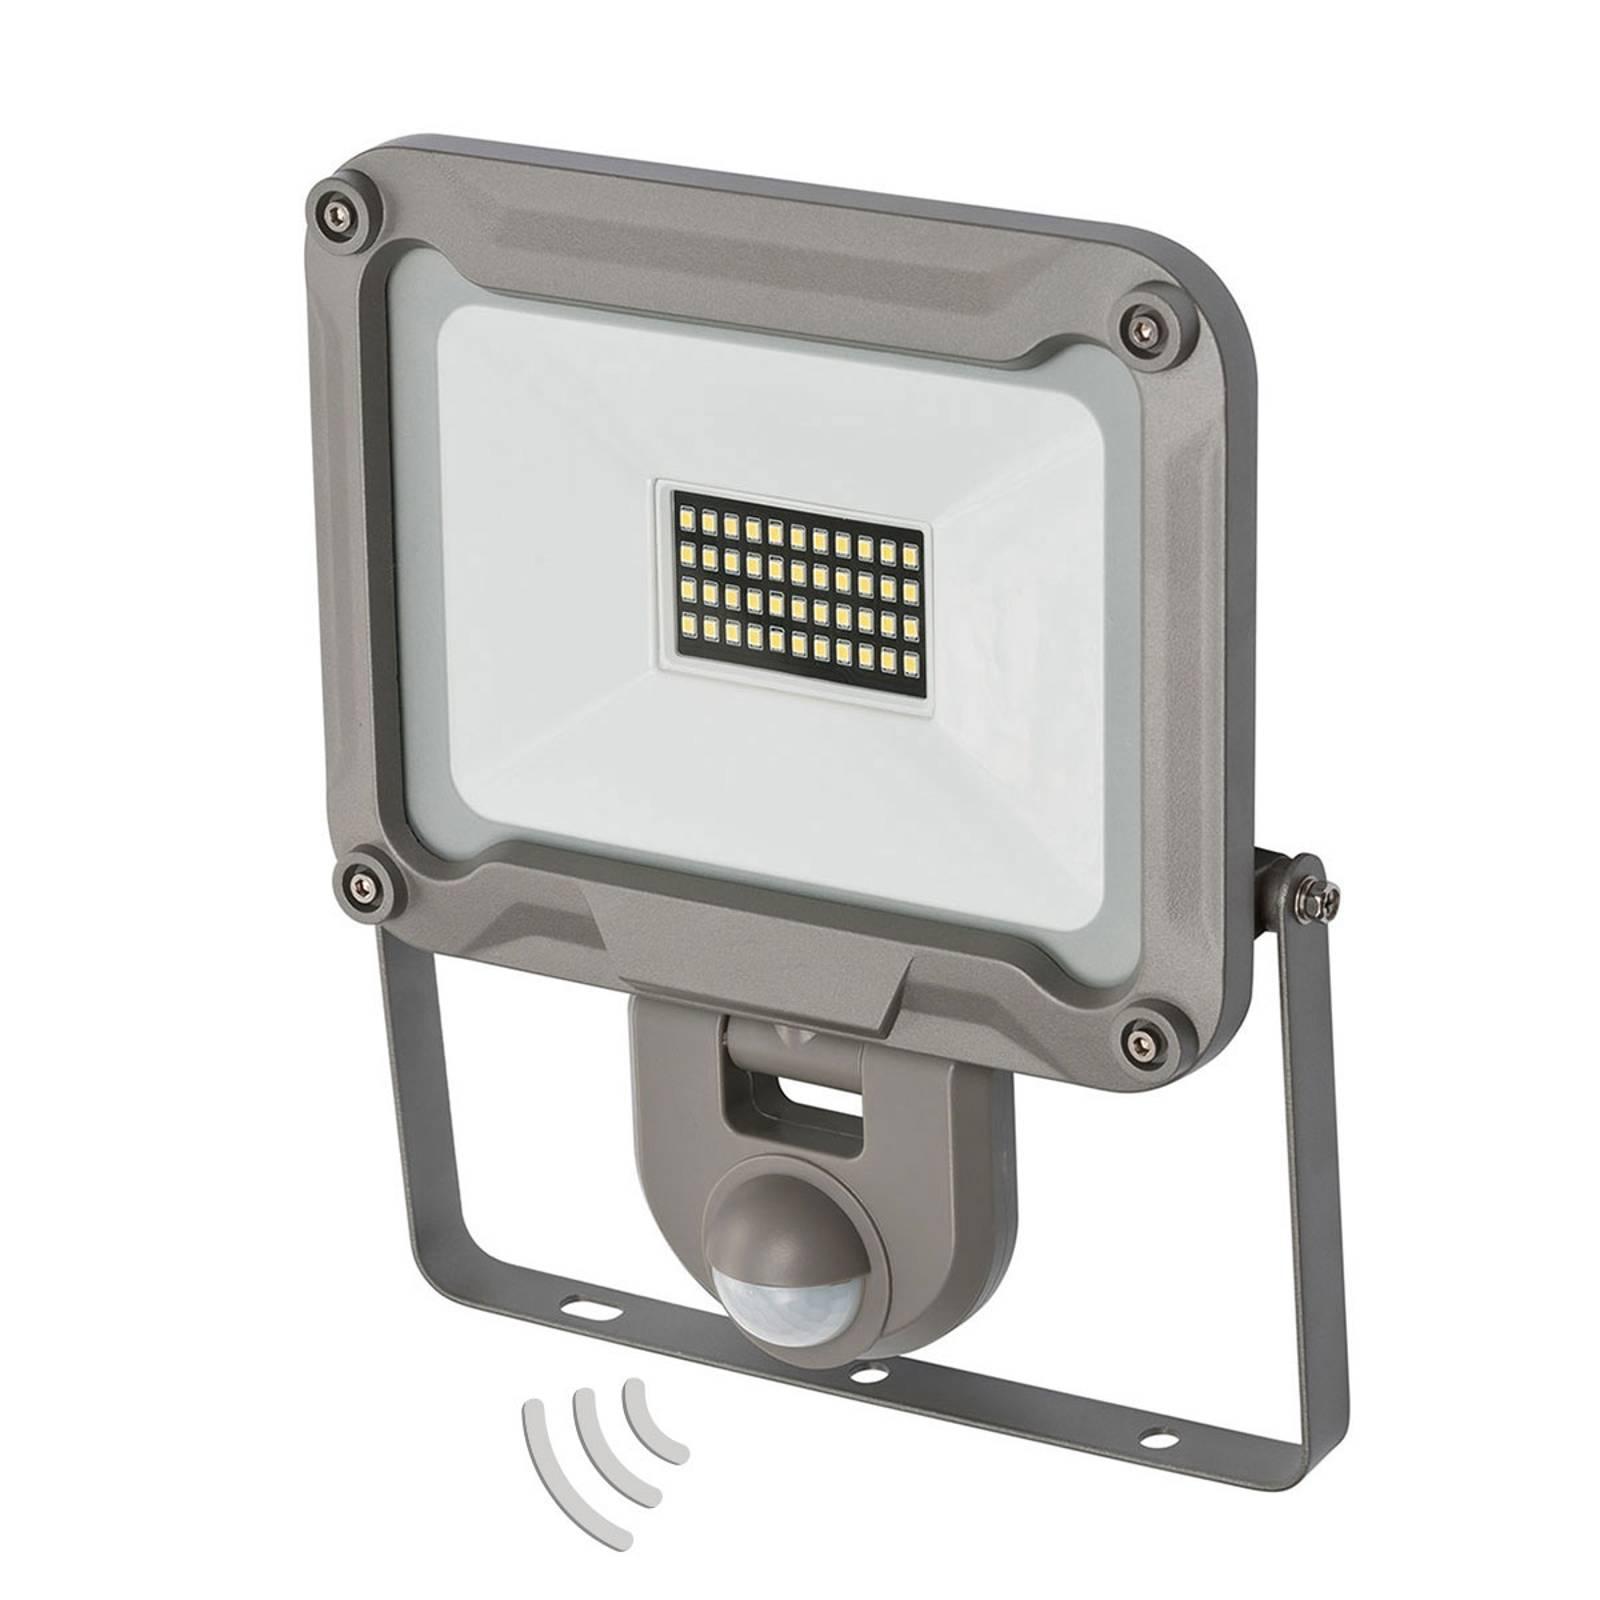 LED-ulkokohdevalaisin Jaro tunnistimella IP44 30W